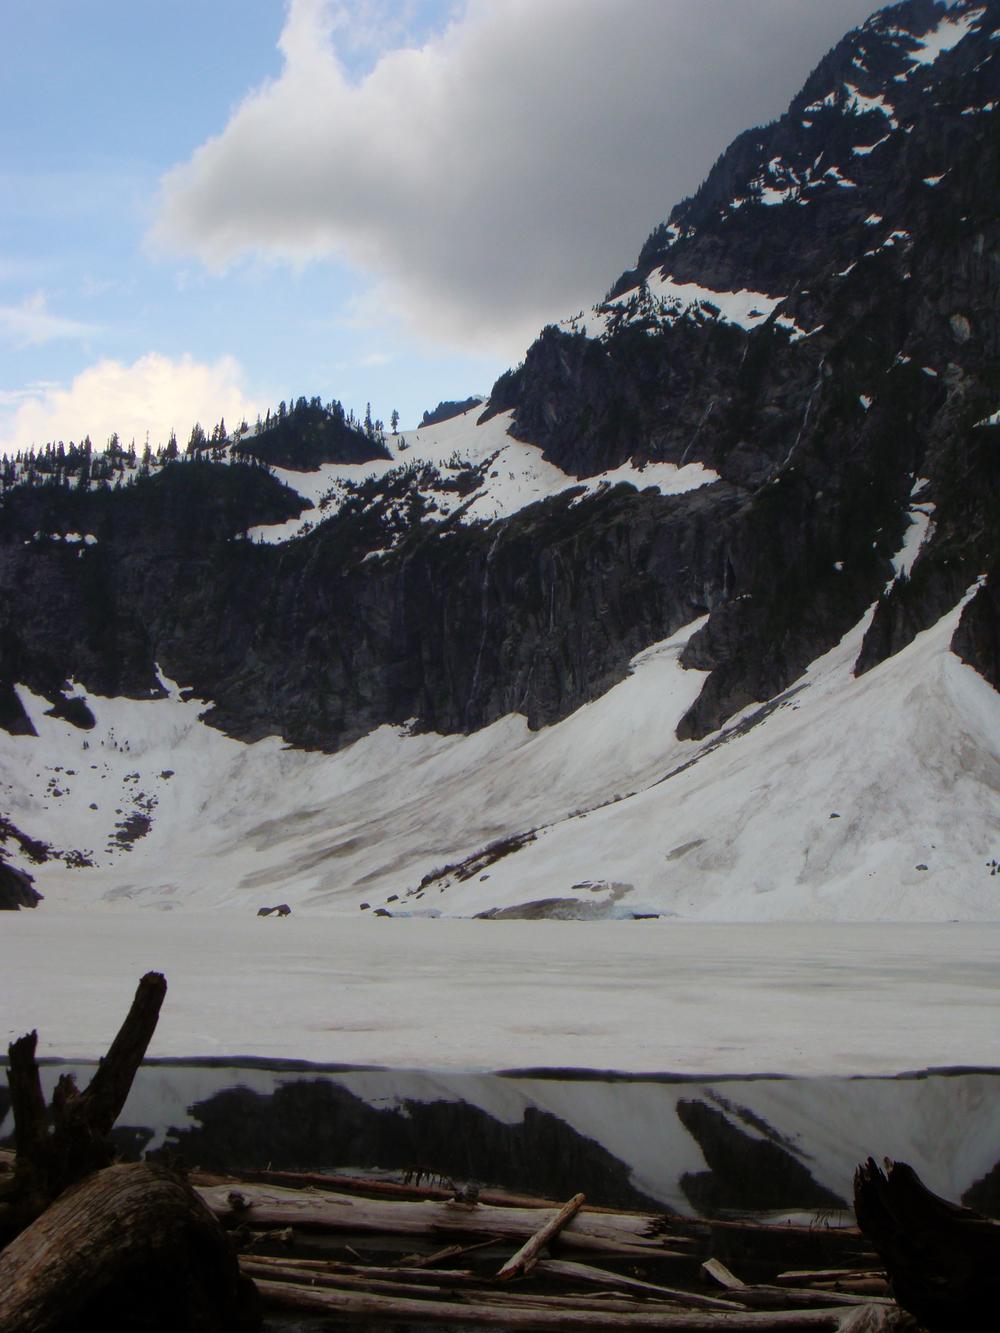 Snowy Lake Serene in 2009